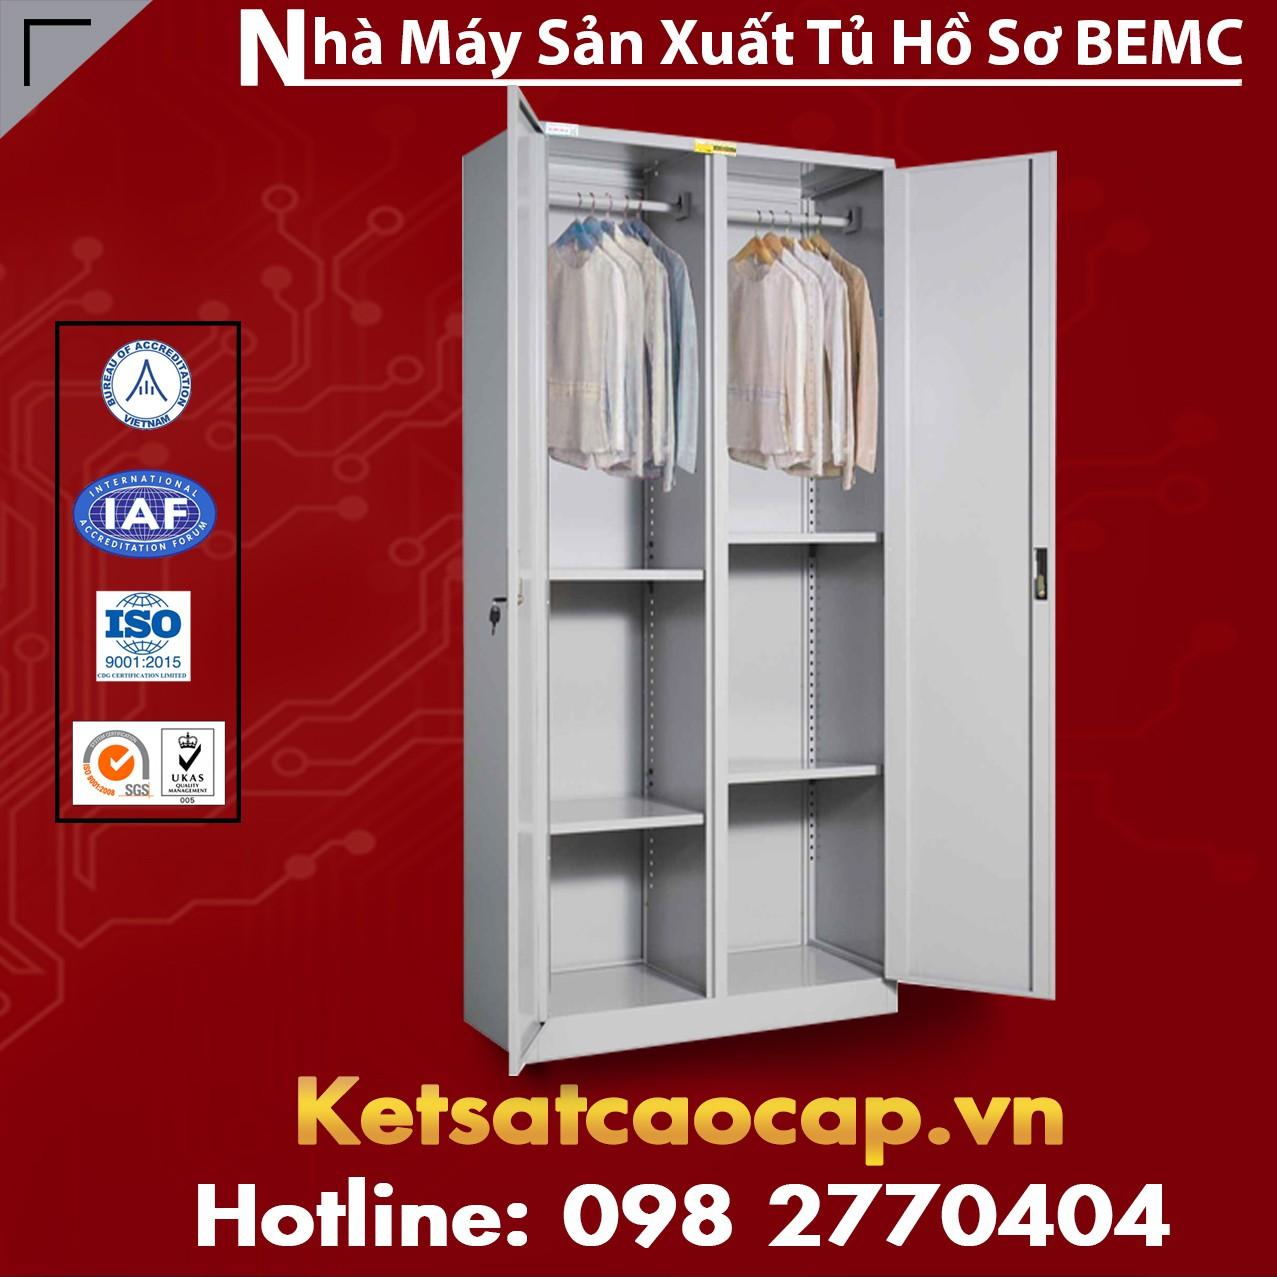 Tủ Sắt Treo Quần Áo BEMC K2